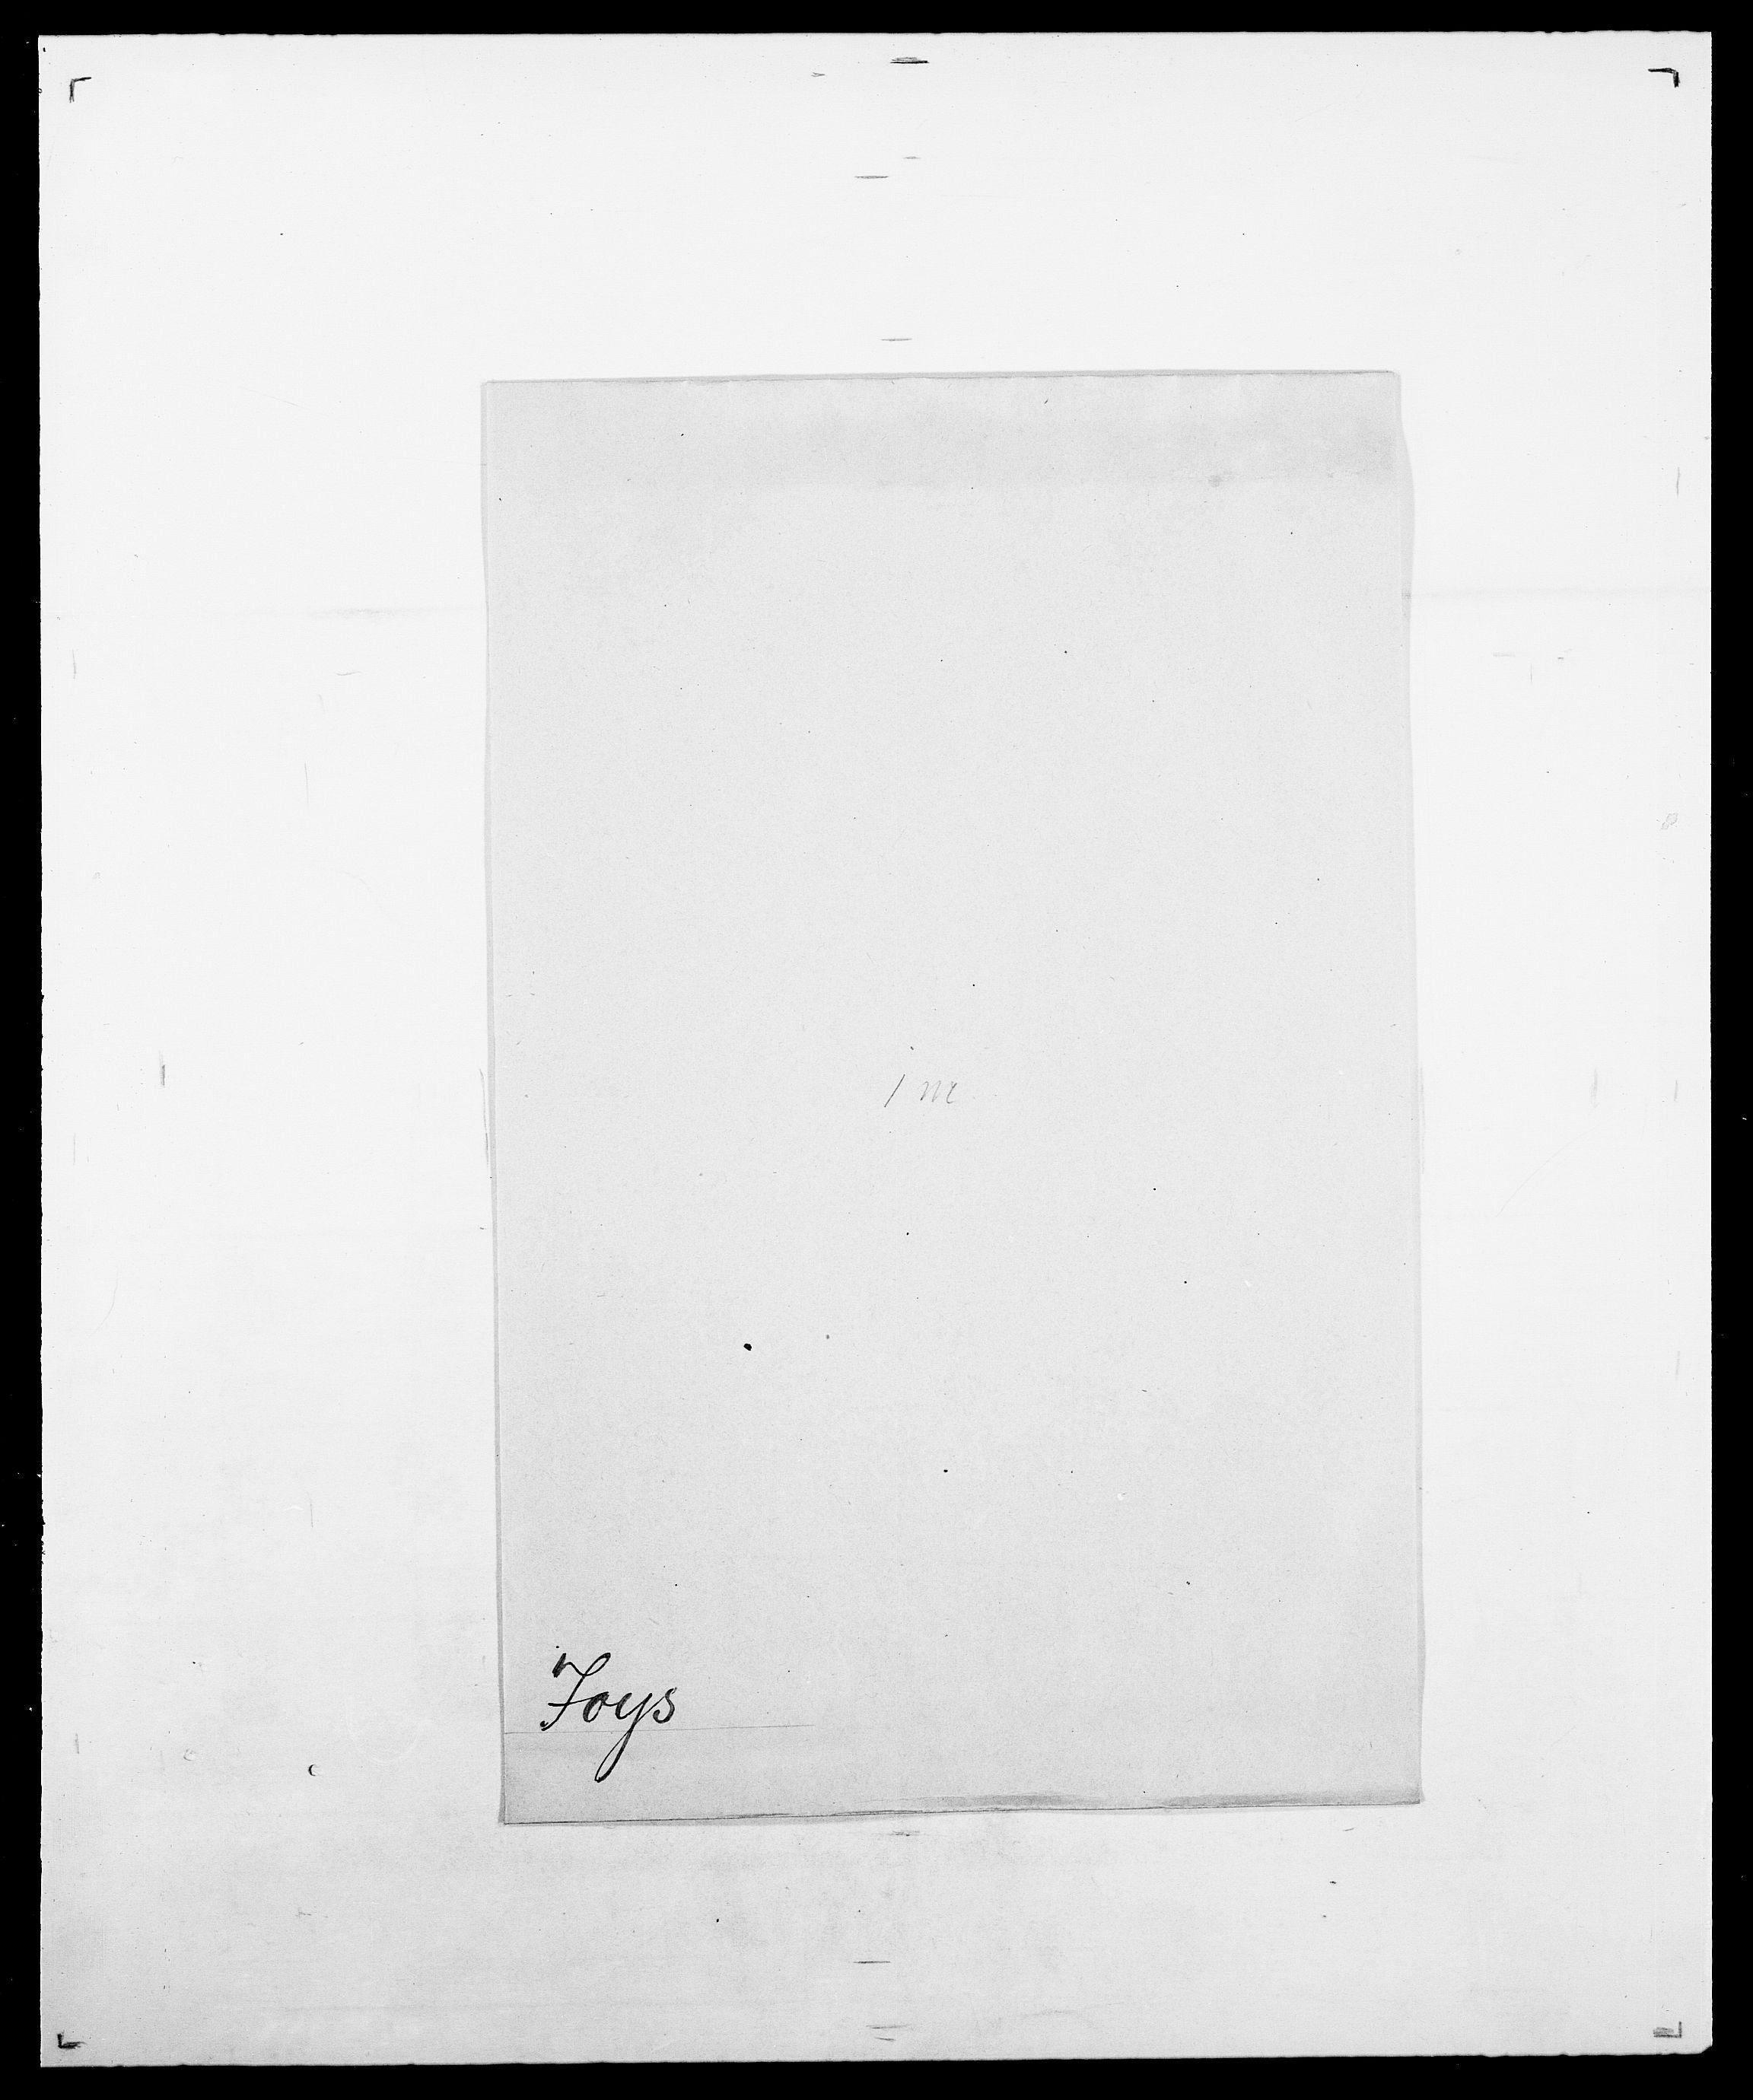 SAO, Delgobe, Charles Antoine - samling, D/Da/L0019: van der Hude - Joys, s. 922